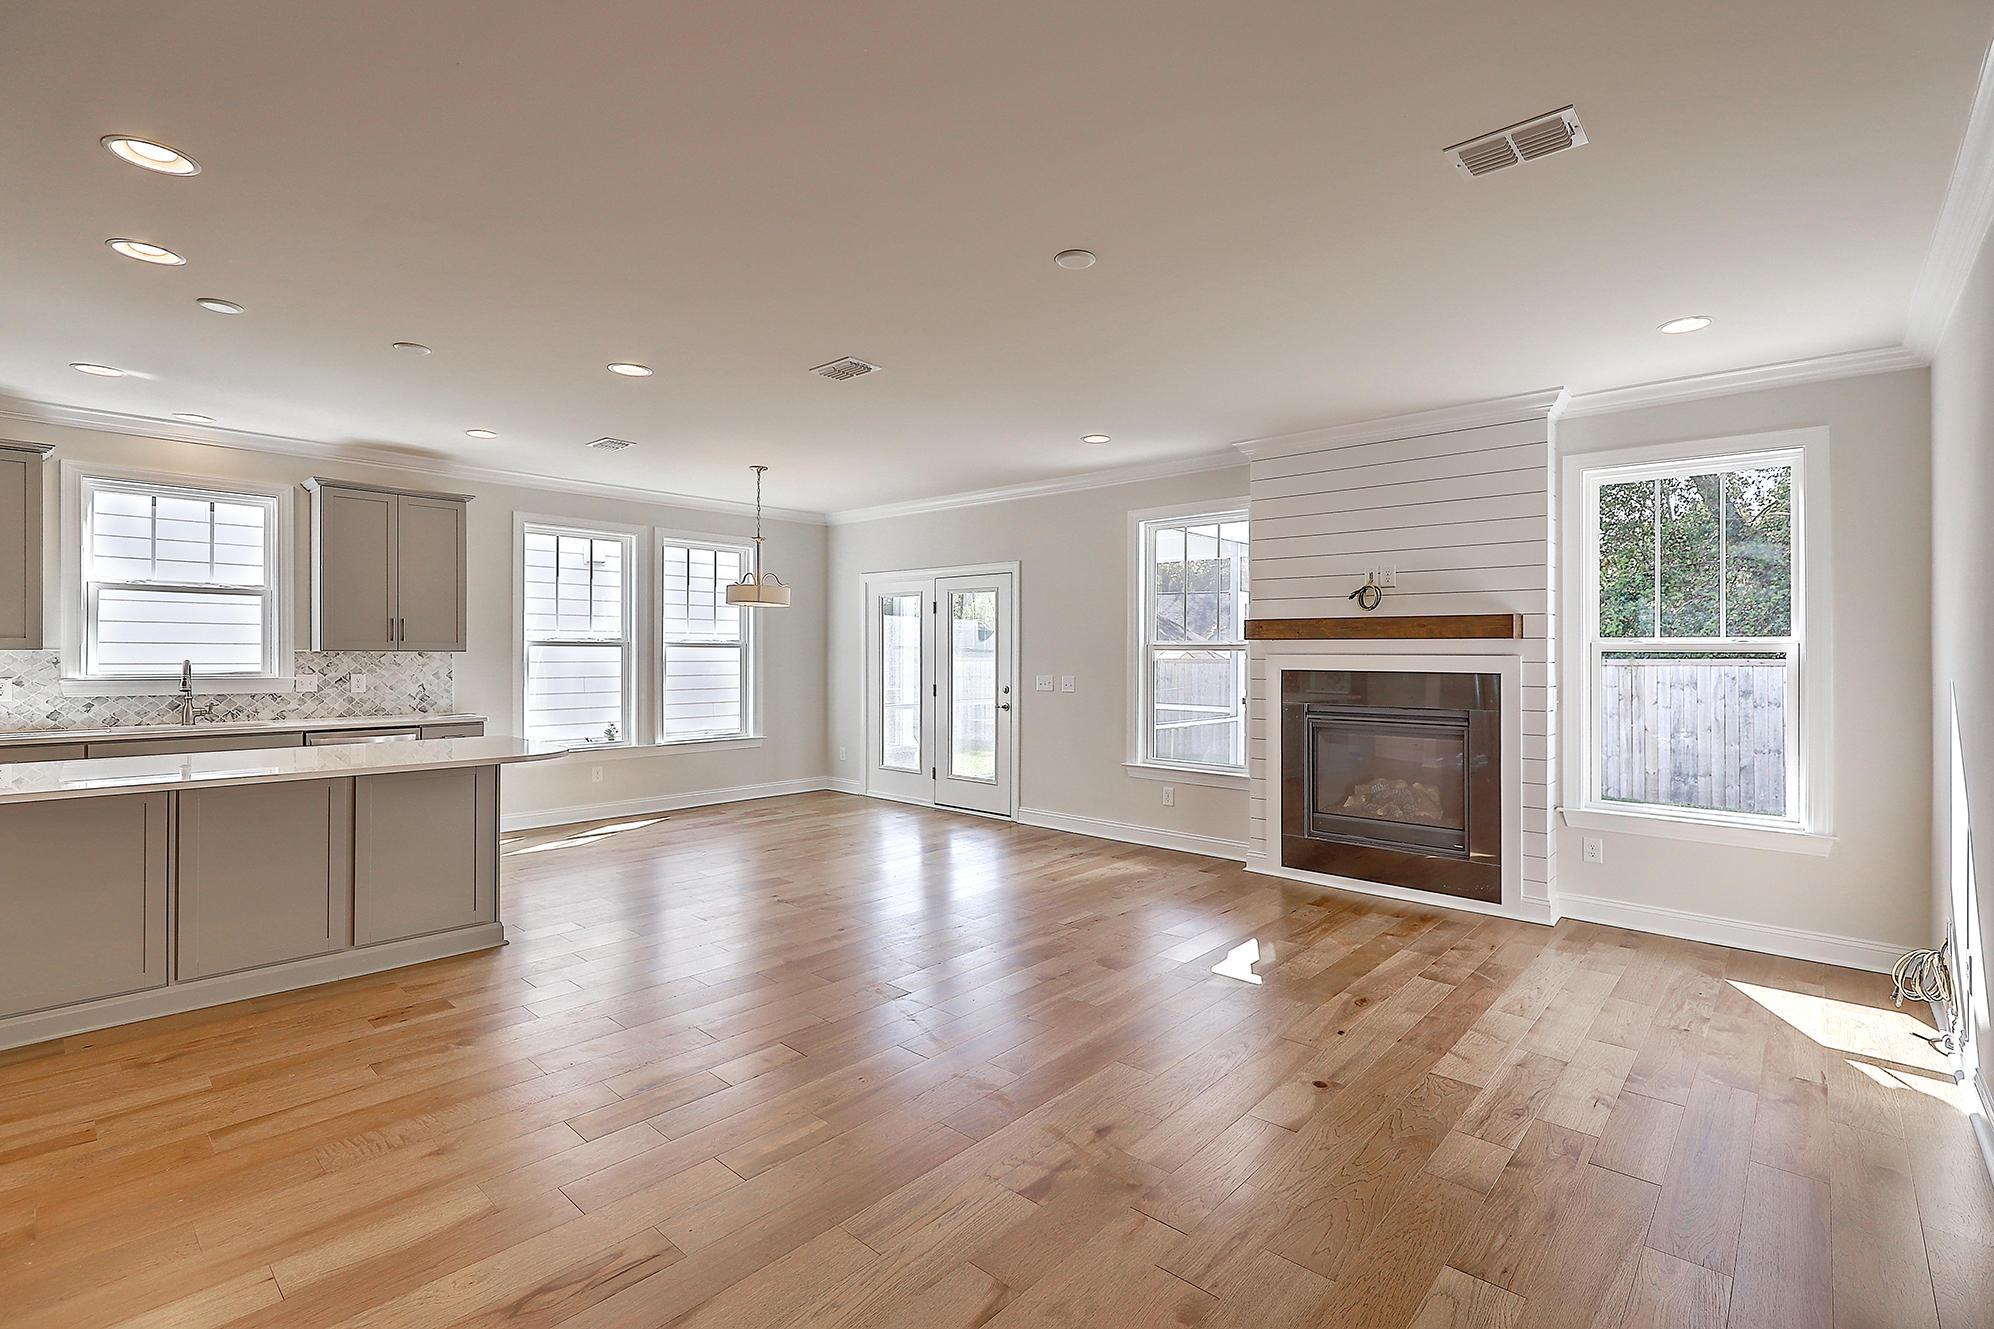 Bentley Park Homes For Sale - 1261 Gannett, Mount Pleasant, SC - 13